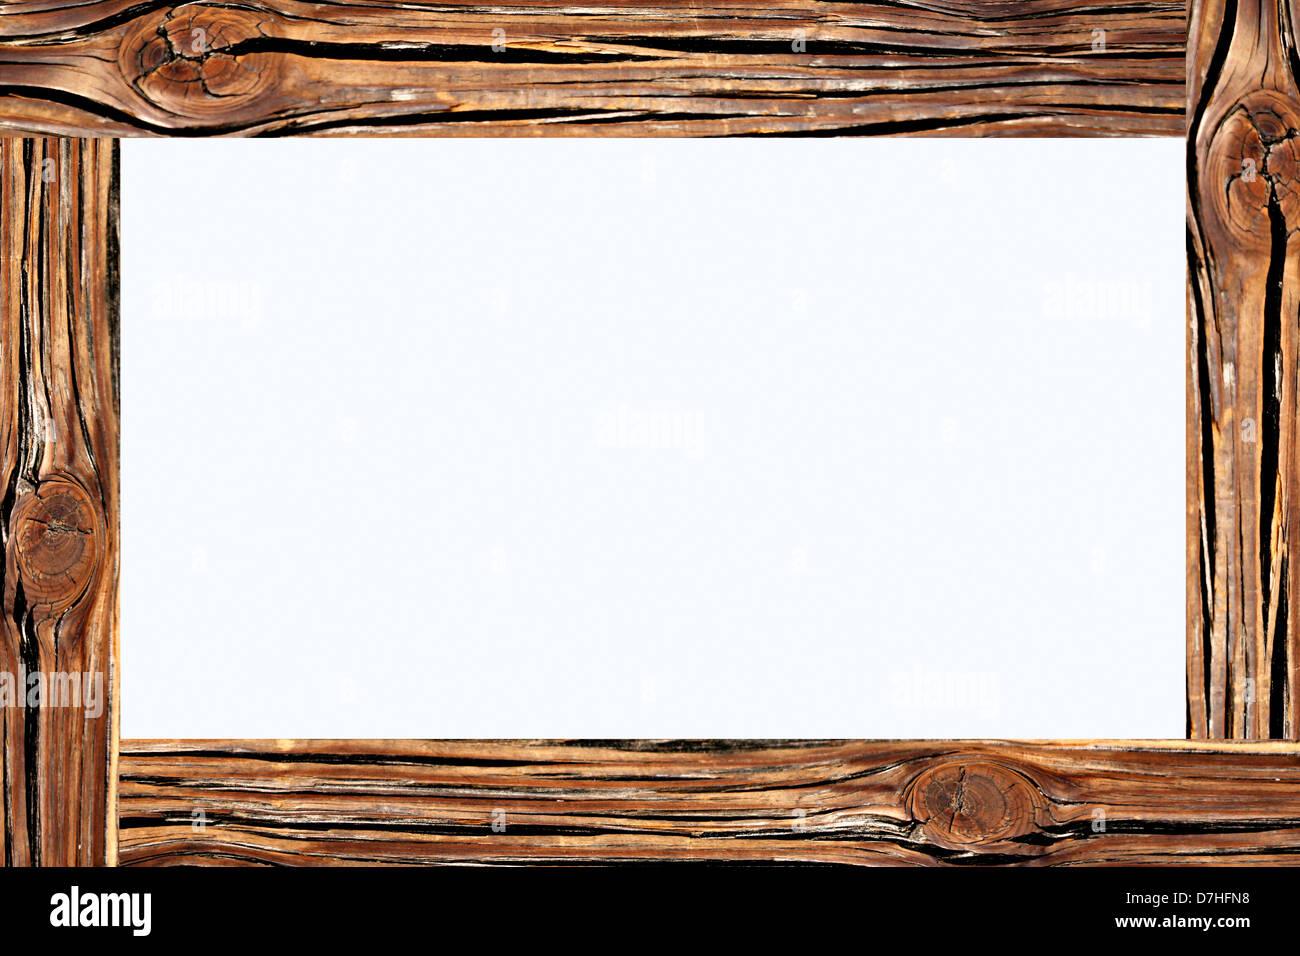 Frame Made Tree Bark Trunk Stock Photos & Frame Made Tree Bark Trunk ...